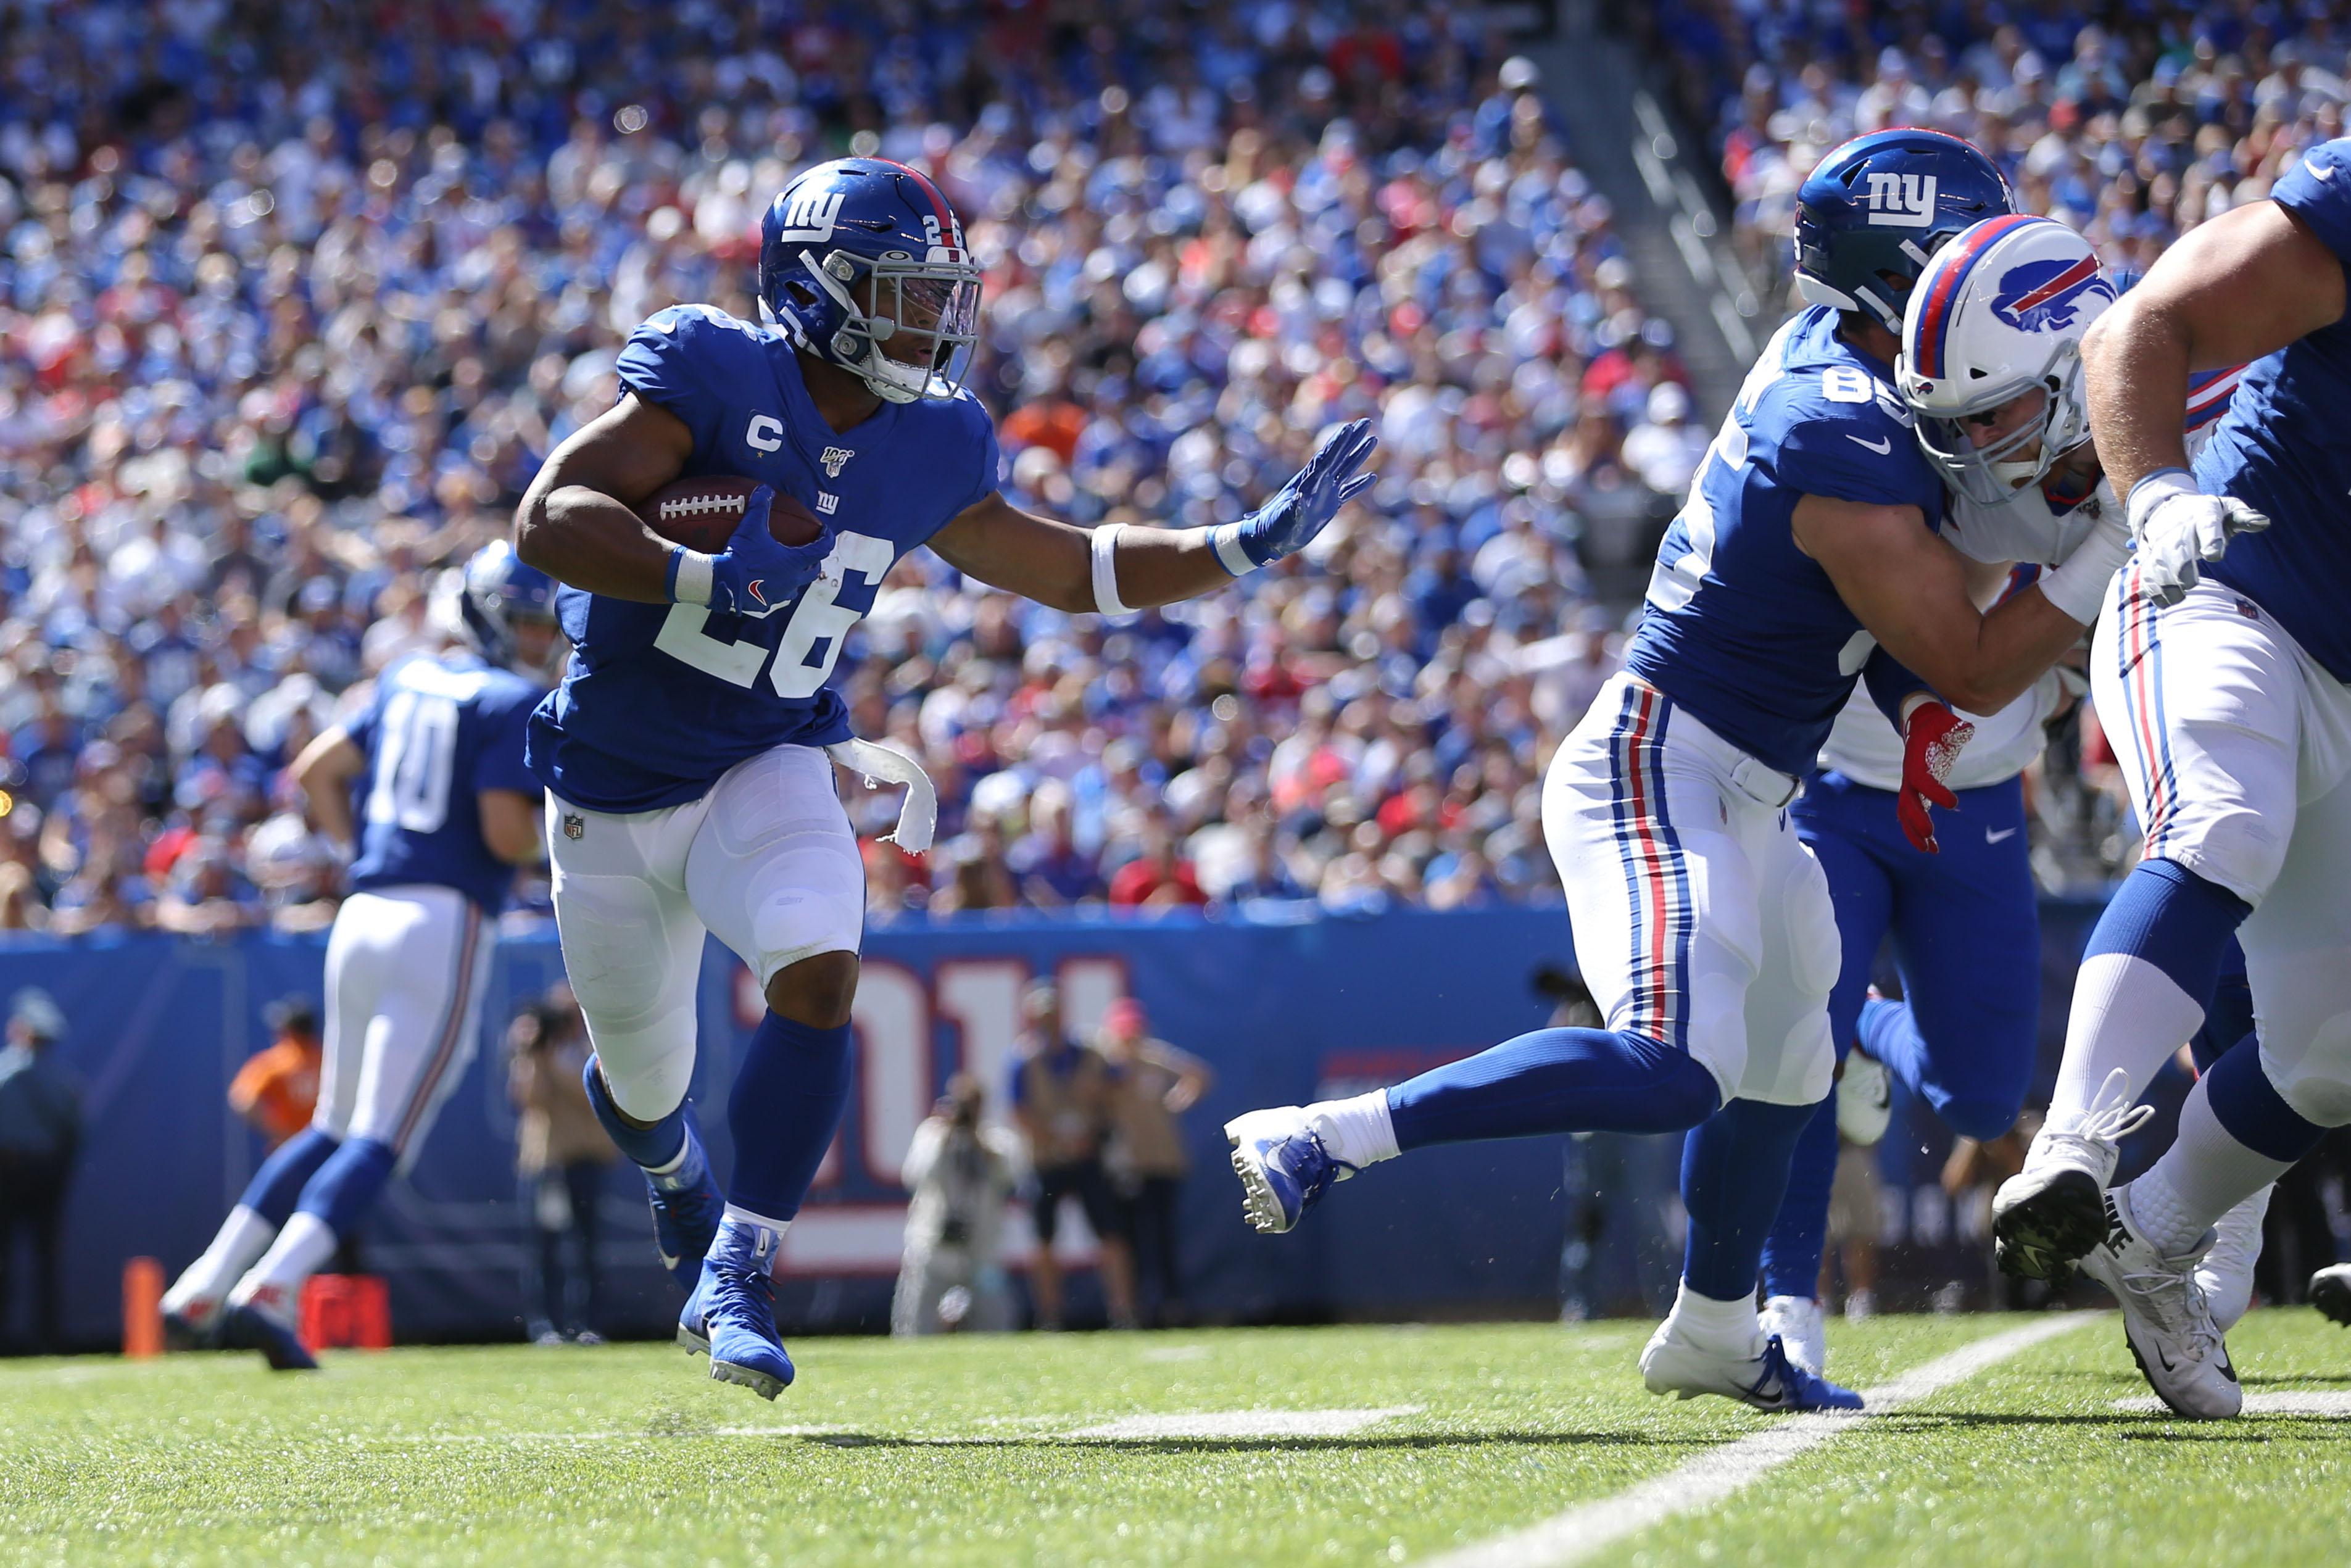 NFL: Buffalo Bills at New York Giants